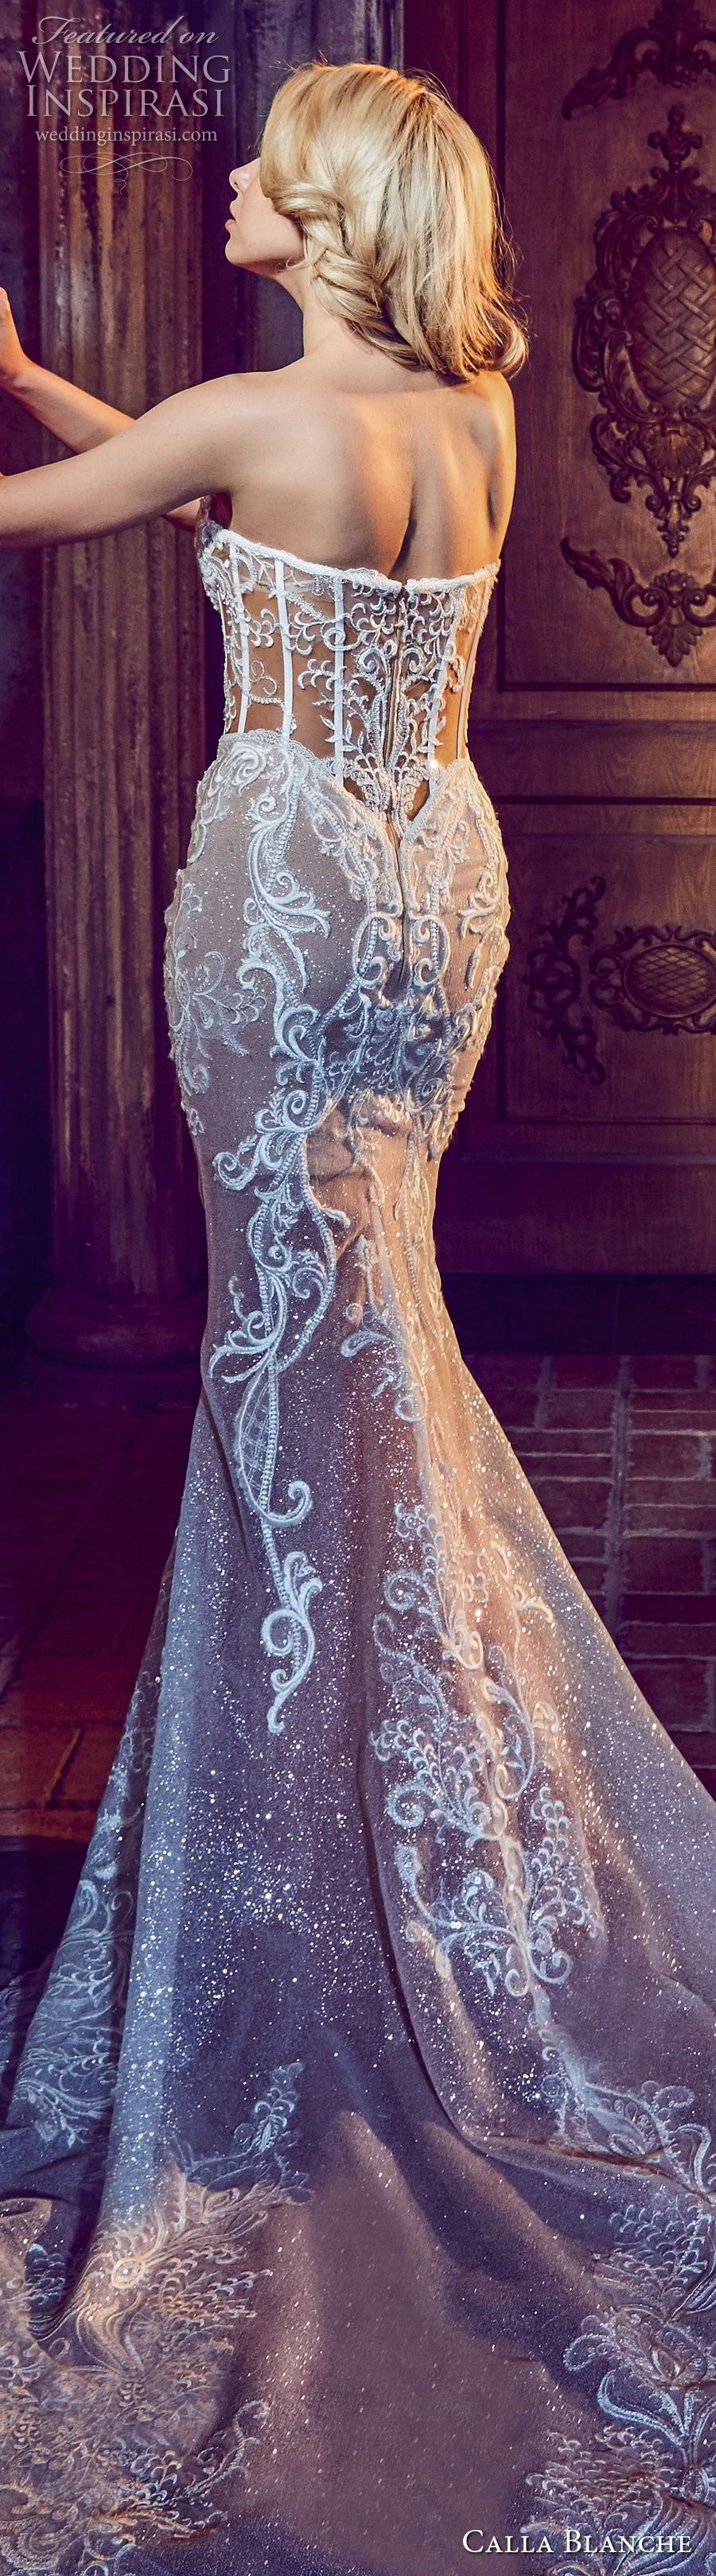 Calla blanche fall wedding dresses mermaid wedding dresses